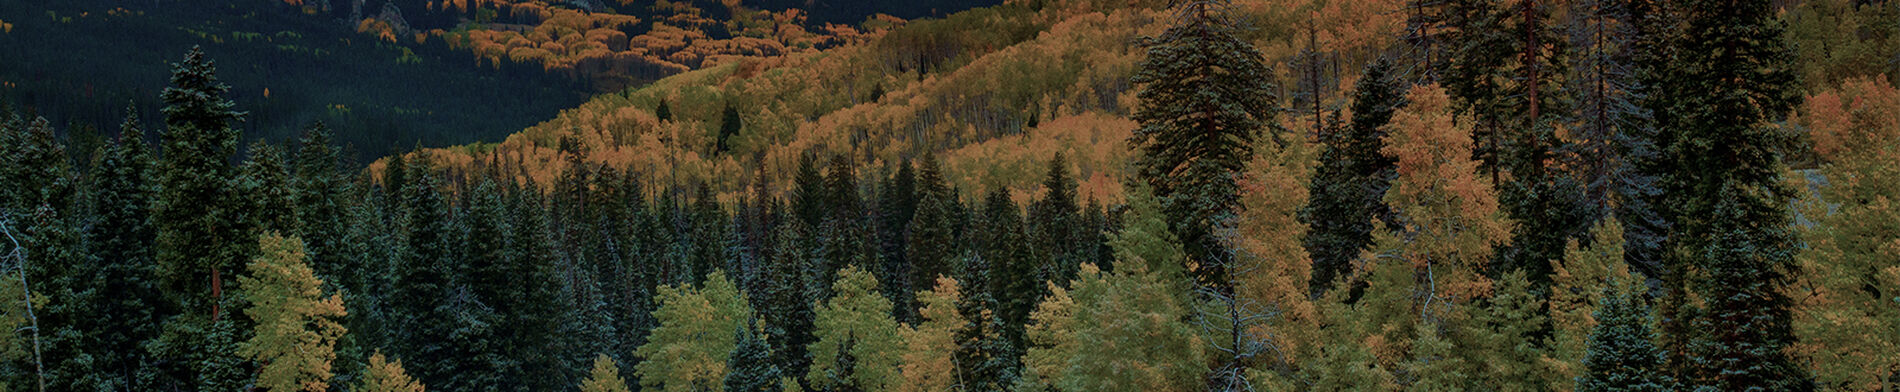 Multi-Colored Forest